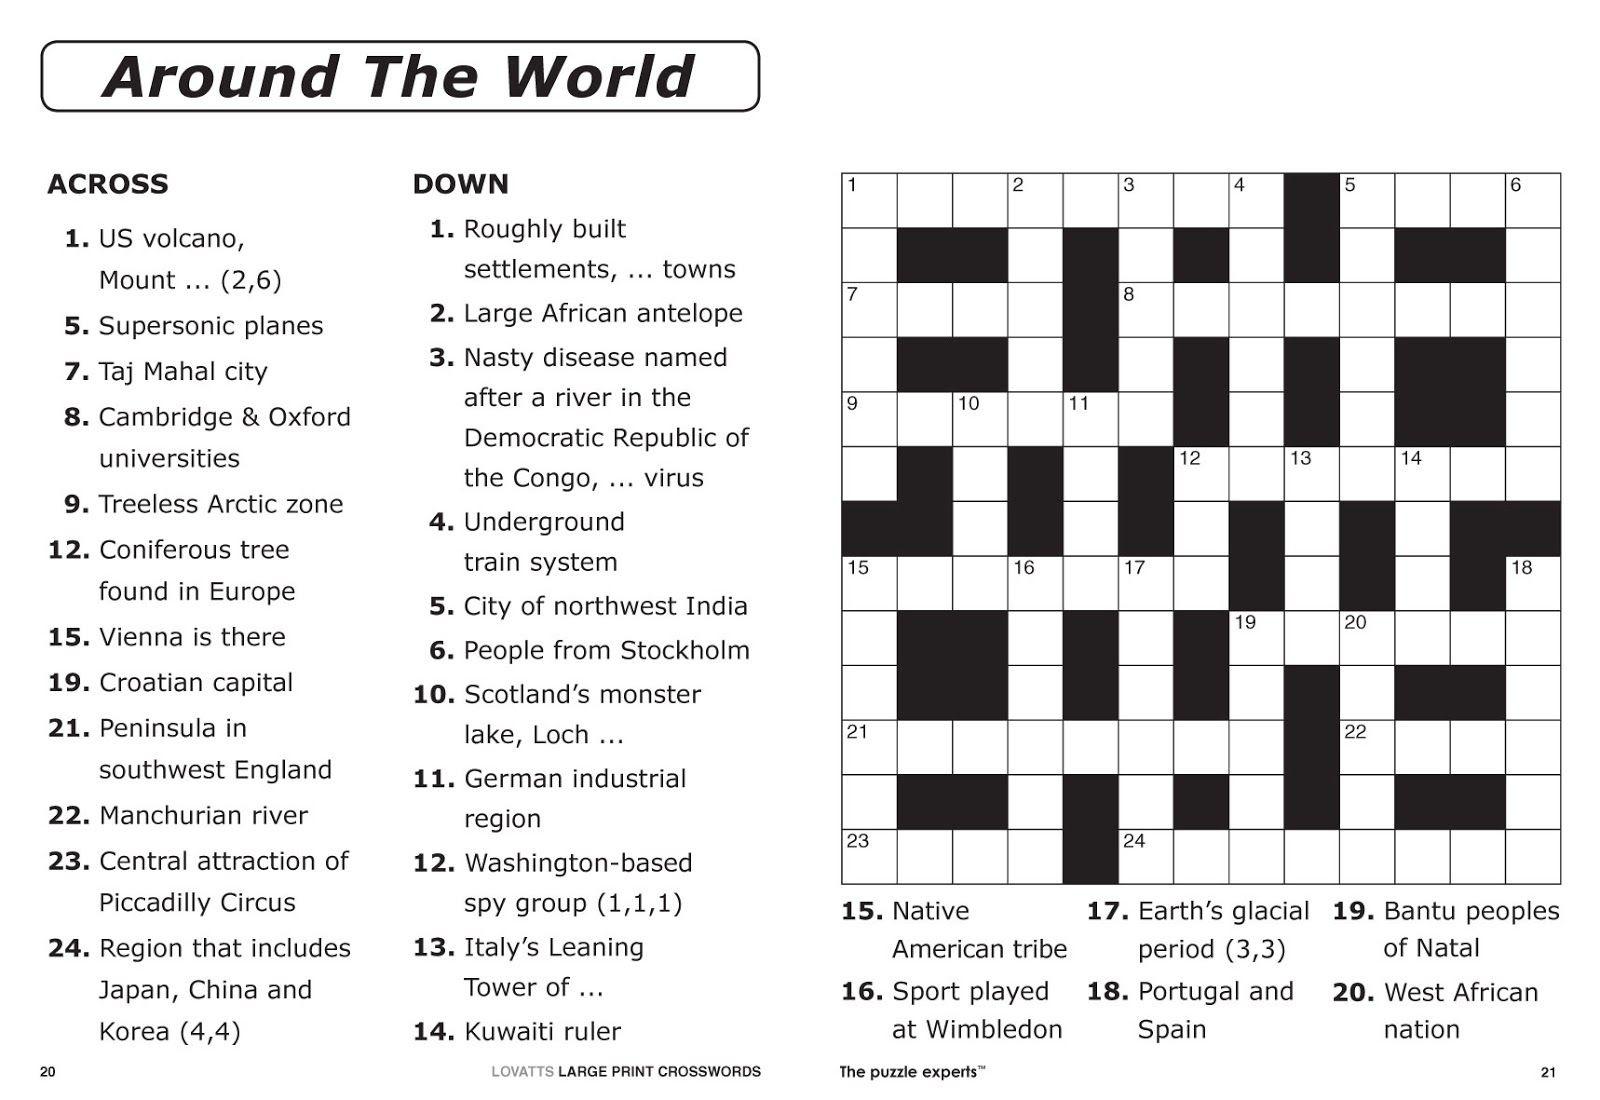 Free Printable Large Print Crossword Puzzles | M3U8 - Free Printable Crossword Puzzle Maker Download